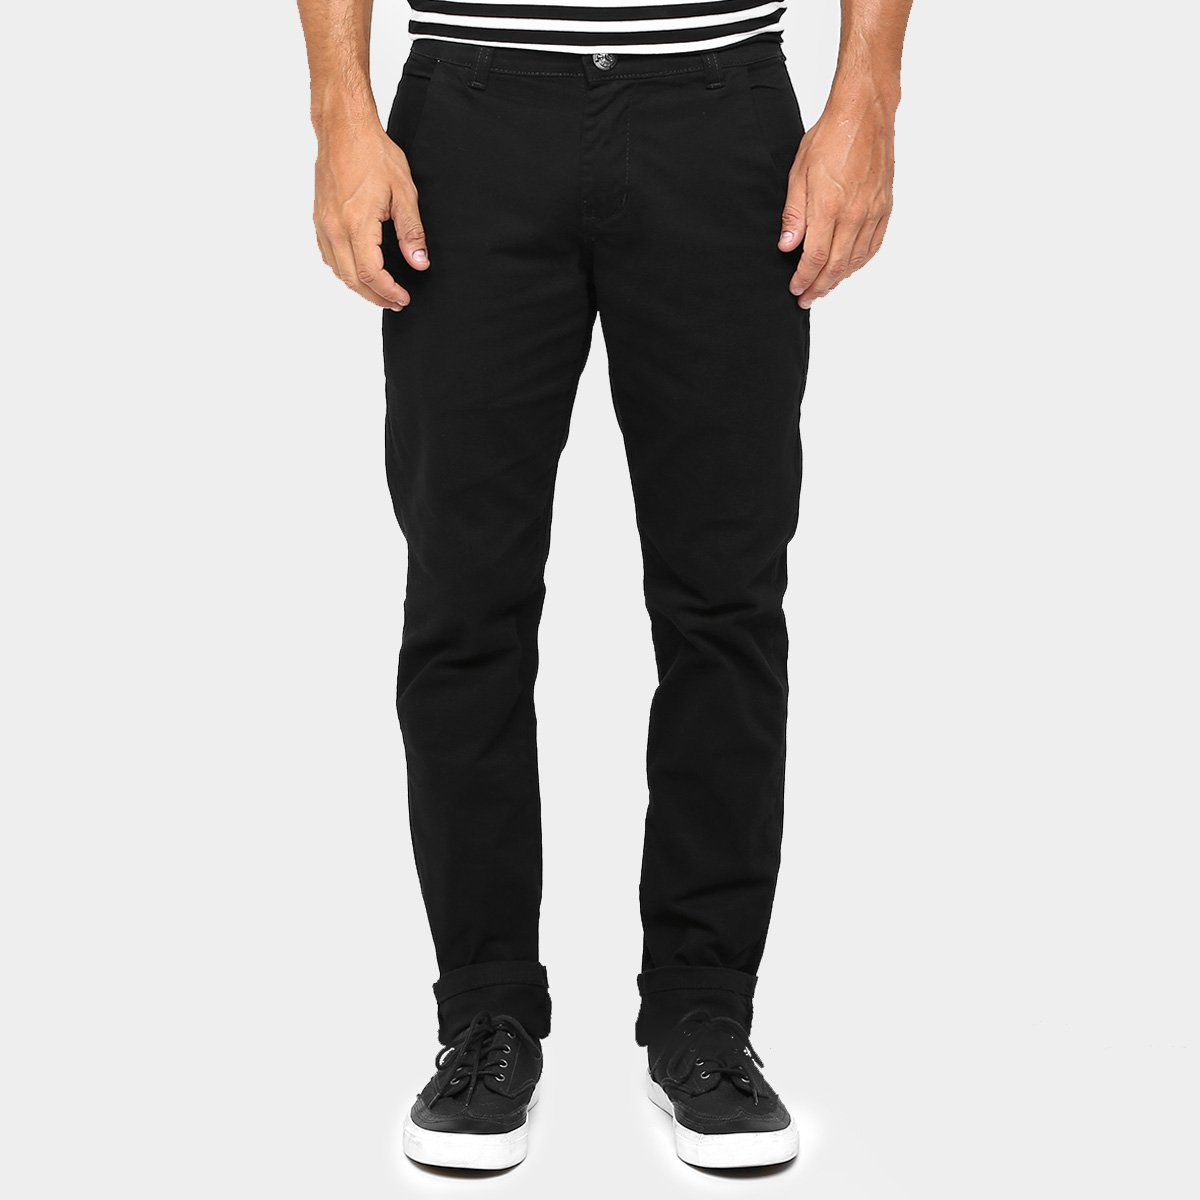 Calça Skinny Preston Color Bolso Faca Masculina - Jeans - Compre Agora  41bdf04711f